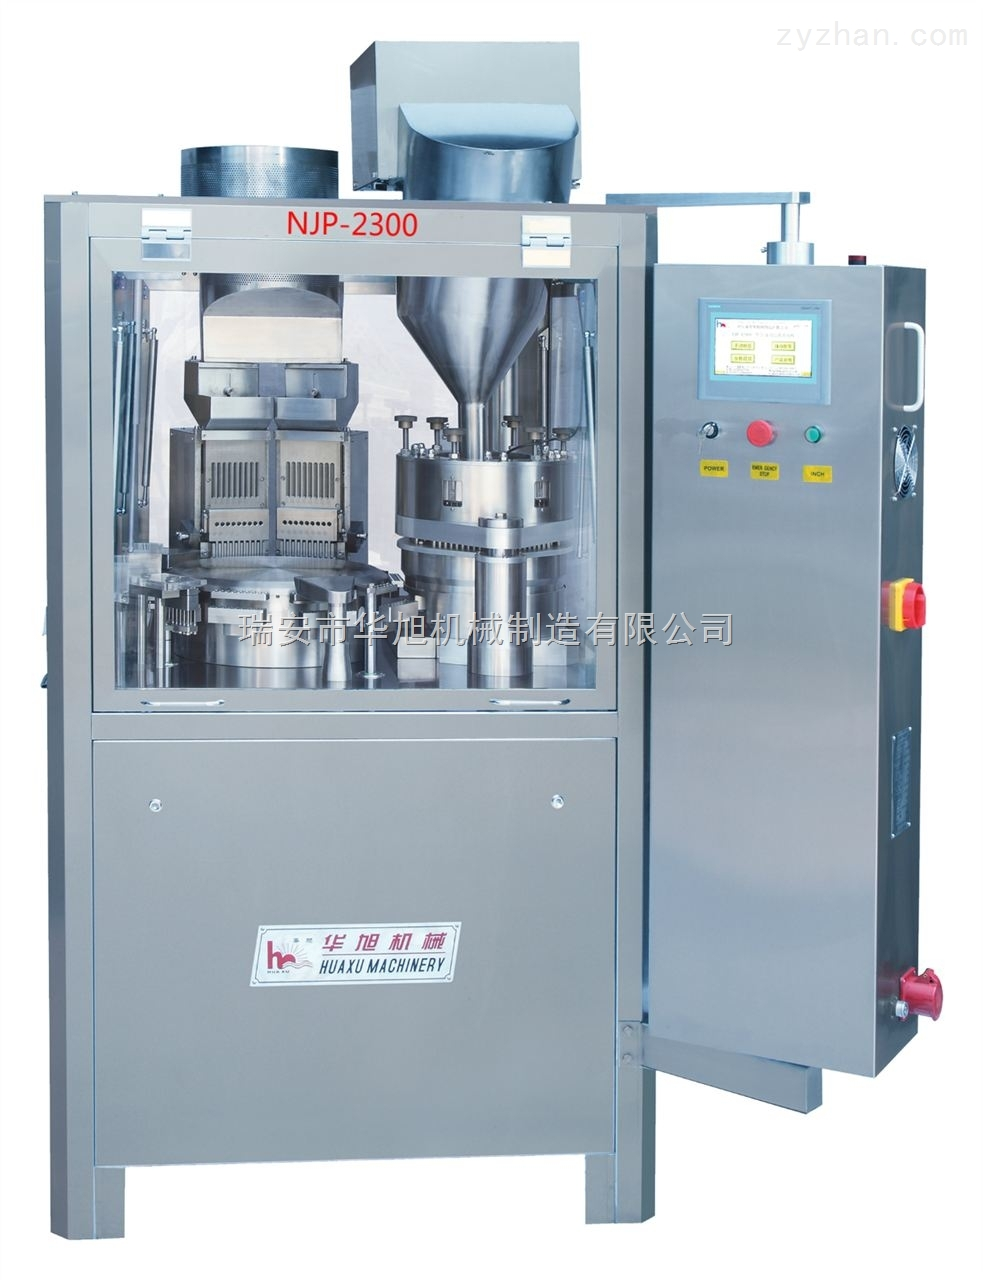 NJP-2300全自动胶囊充填机